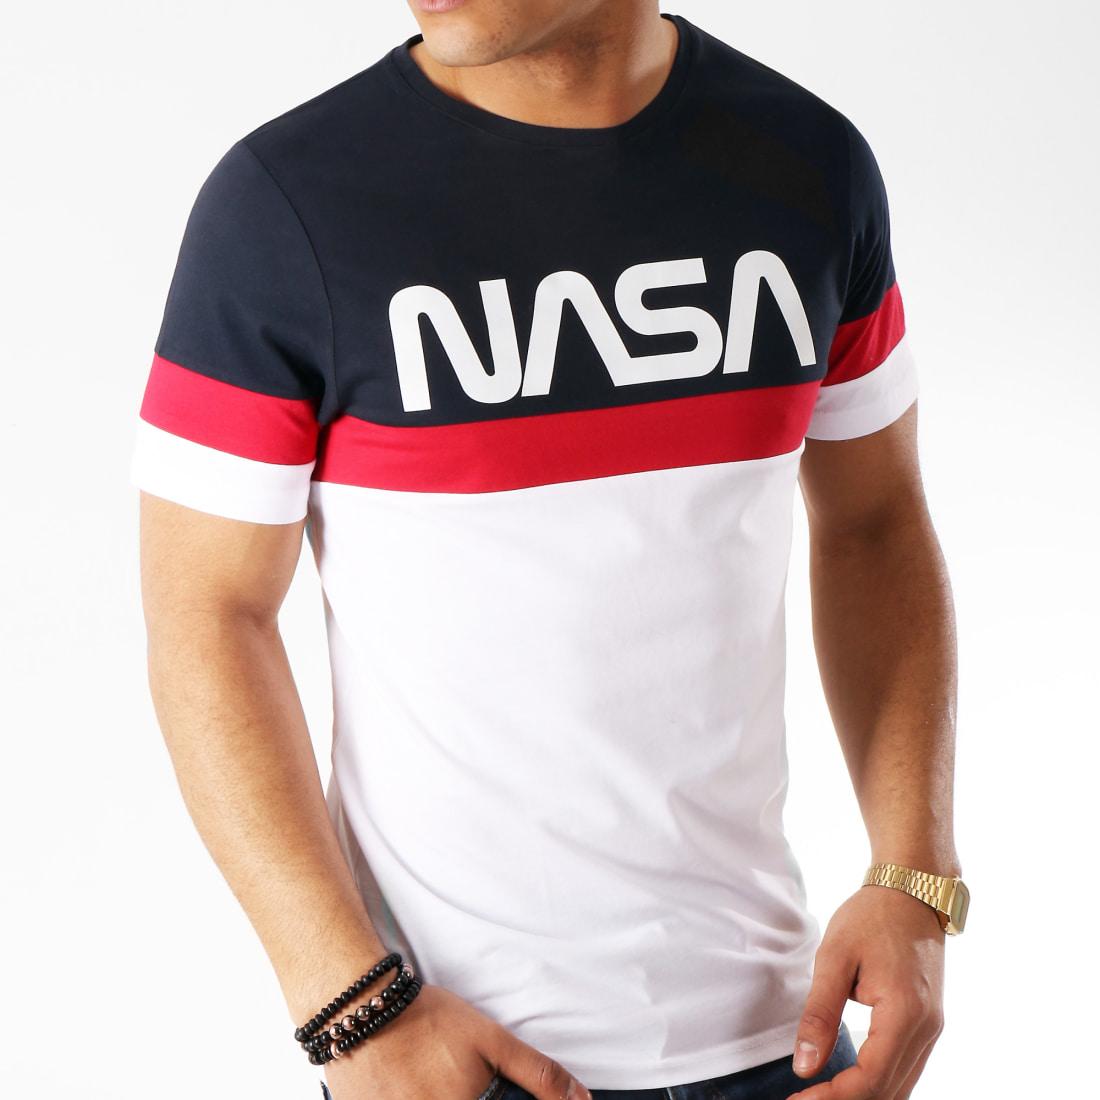 NASA Tee Shirt Tape Tricolore Bleu Marine Blanc Rouge